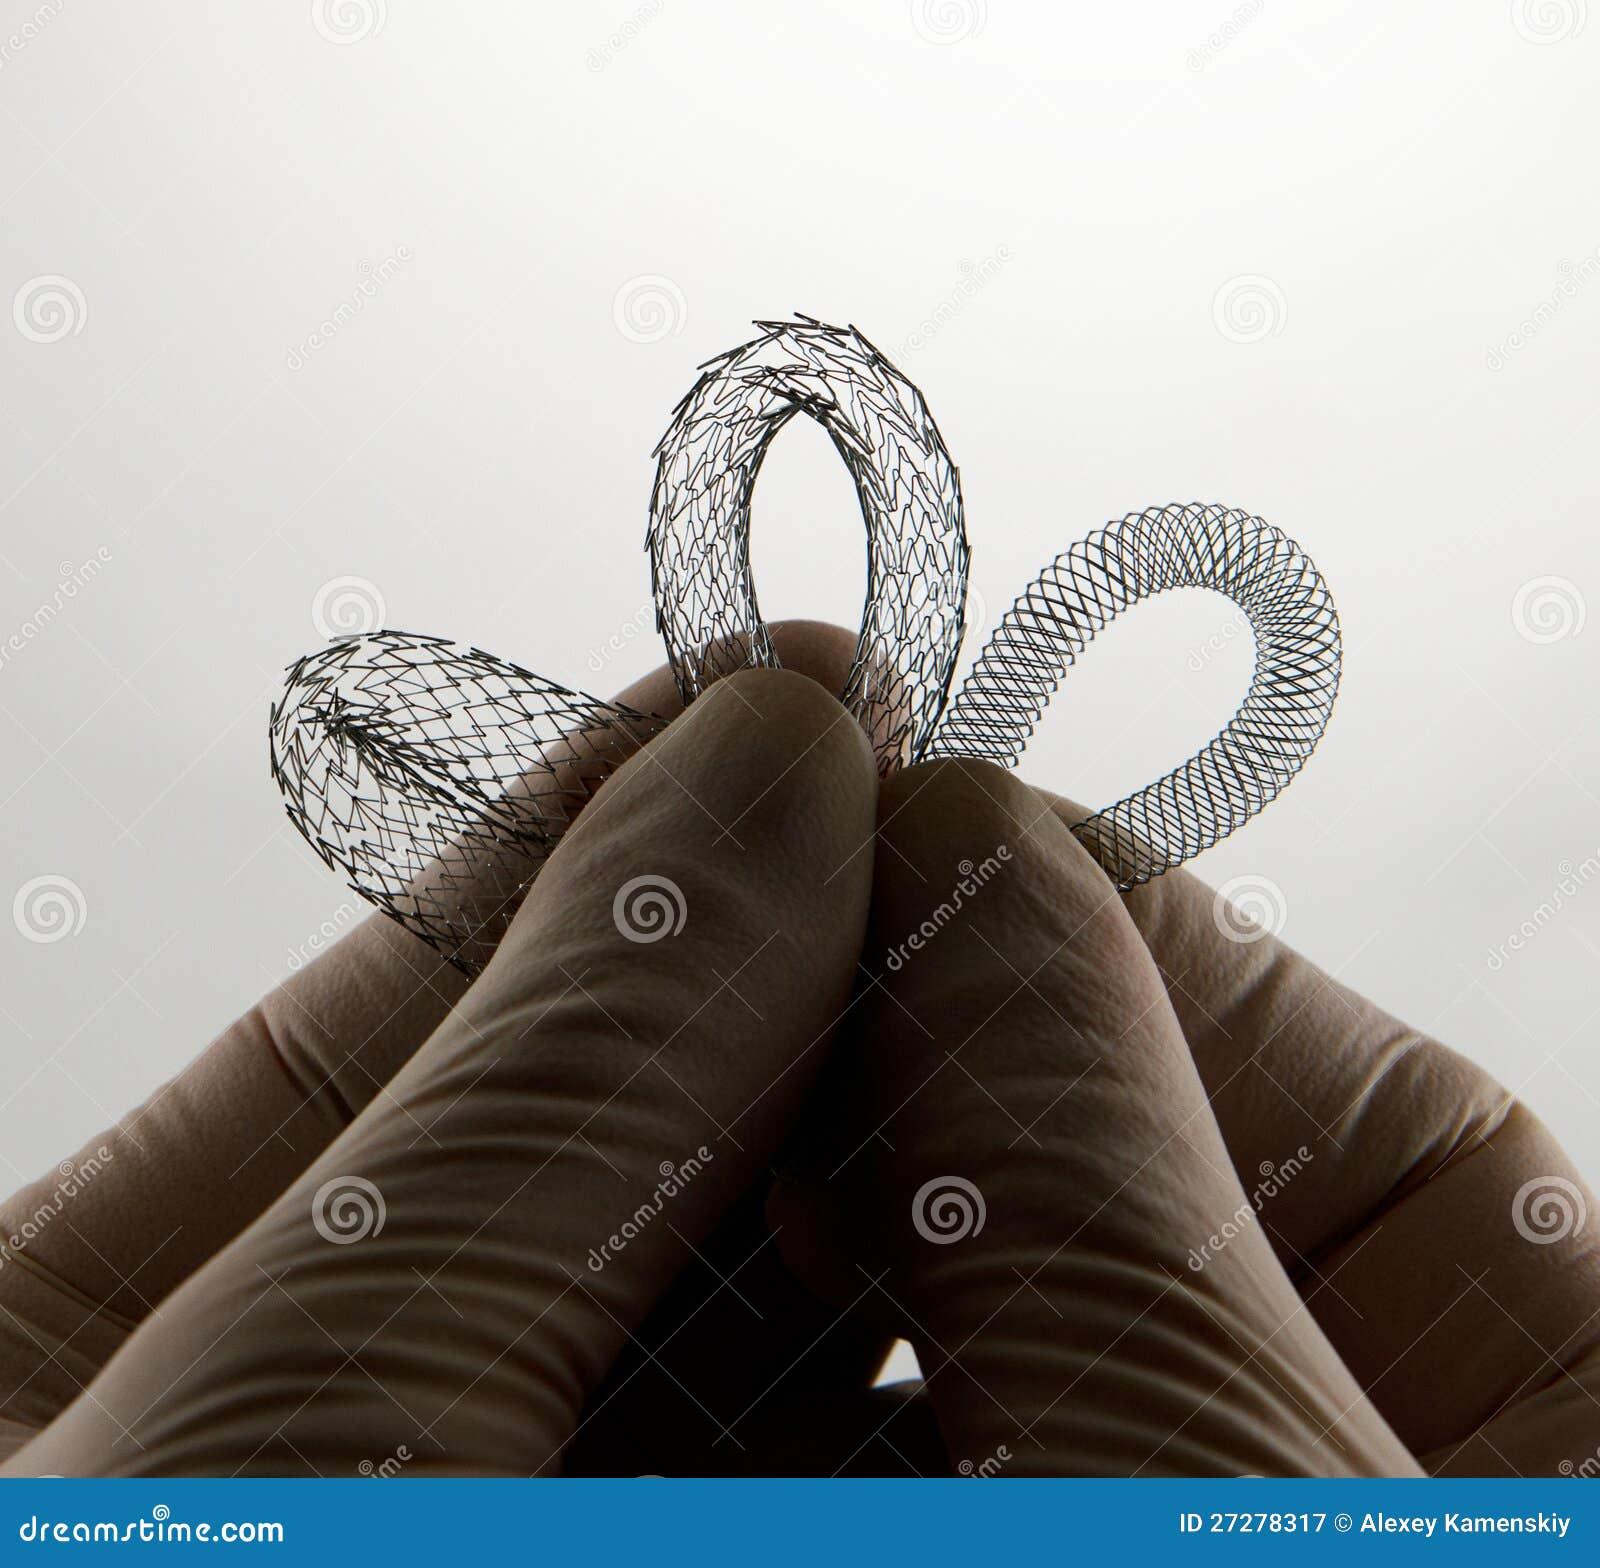 Endovascular手术的三stents